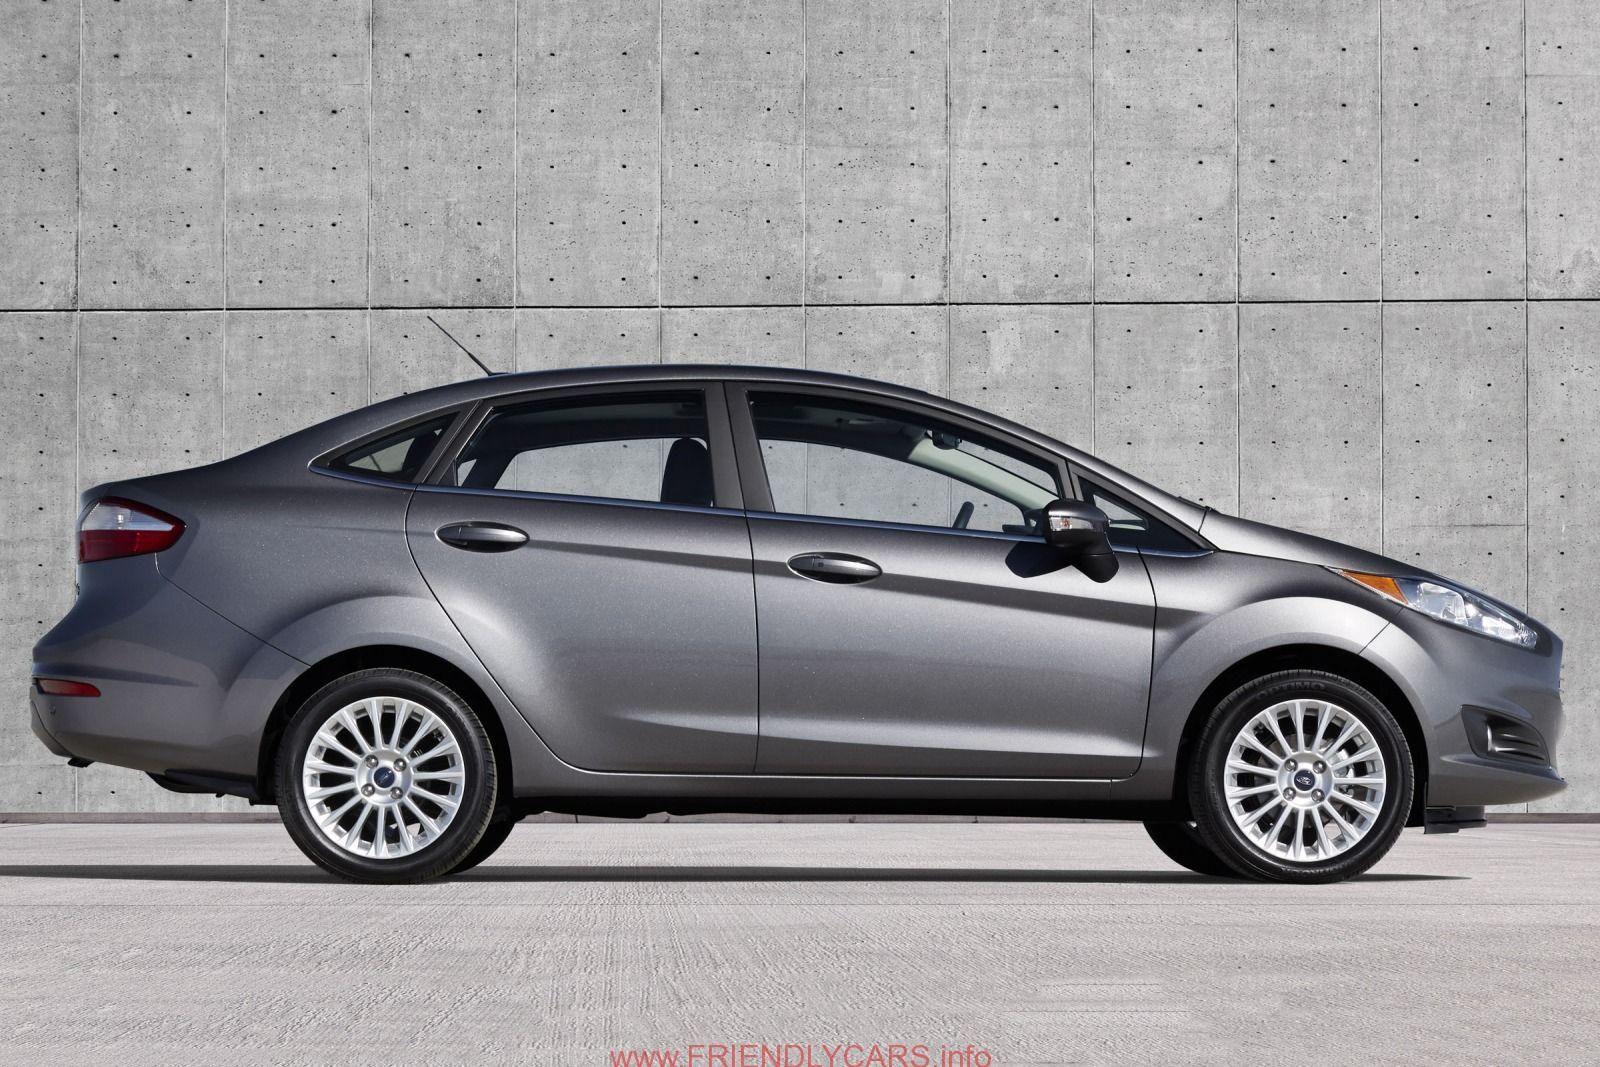 Cool Ford Fiesta 2013 Sedan Grey Car Images Hd 2014 Ford Fiesta Titanium Sedan Price Specs Sedan Ford